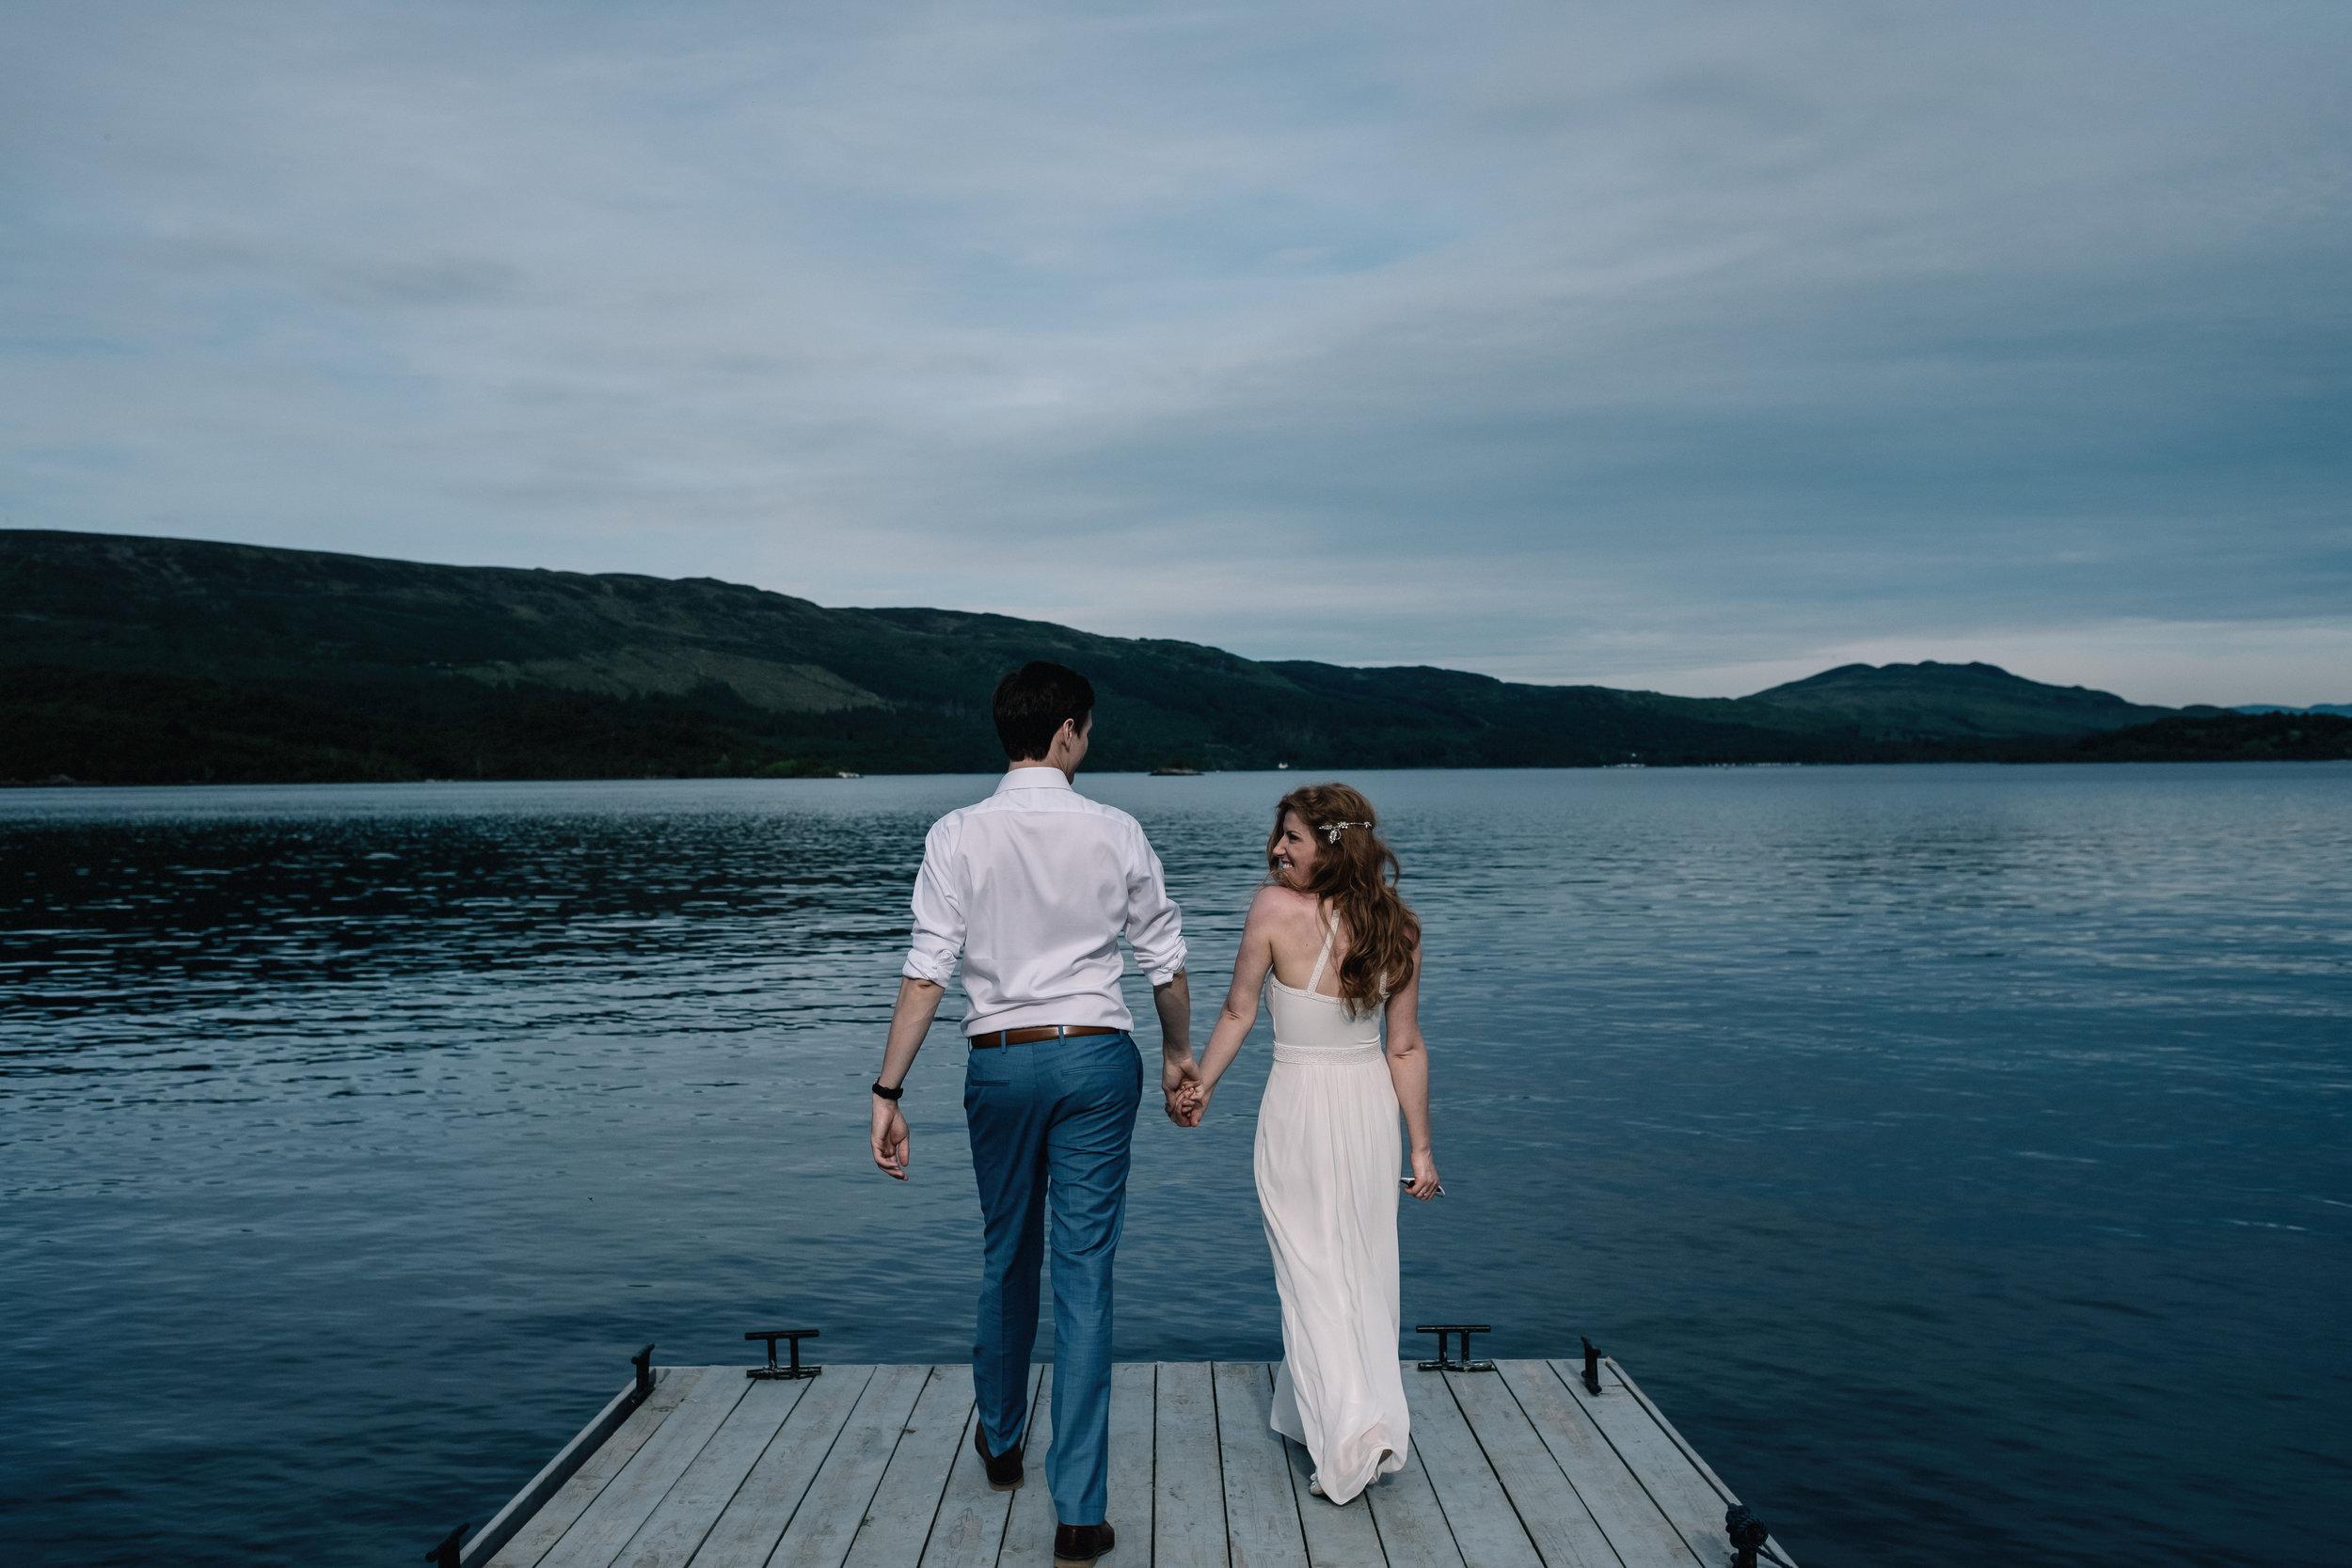 Bride and groom walk on pier